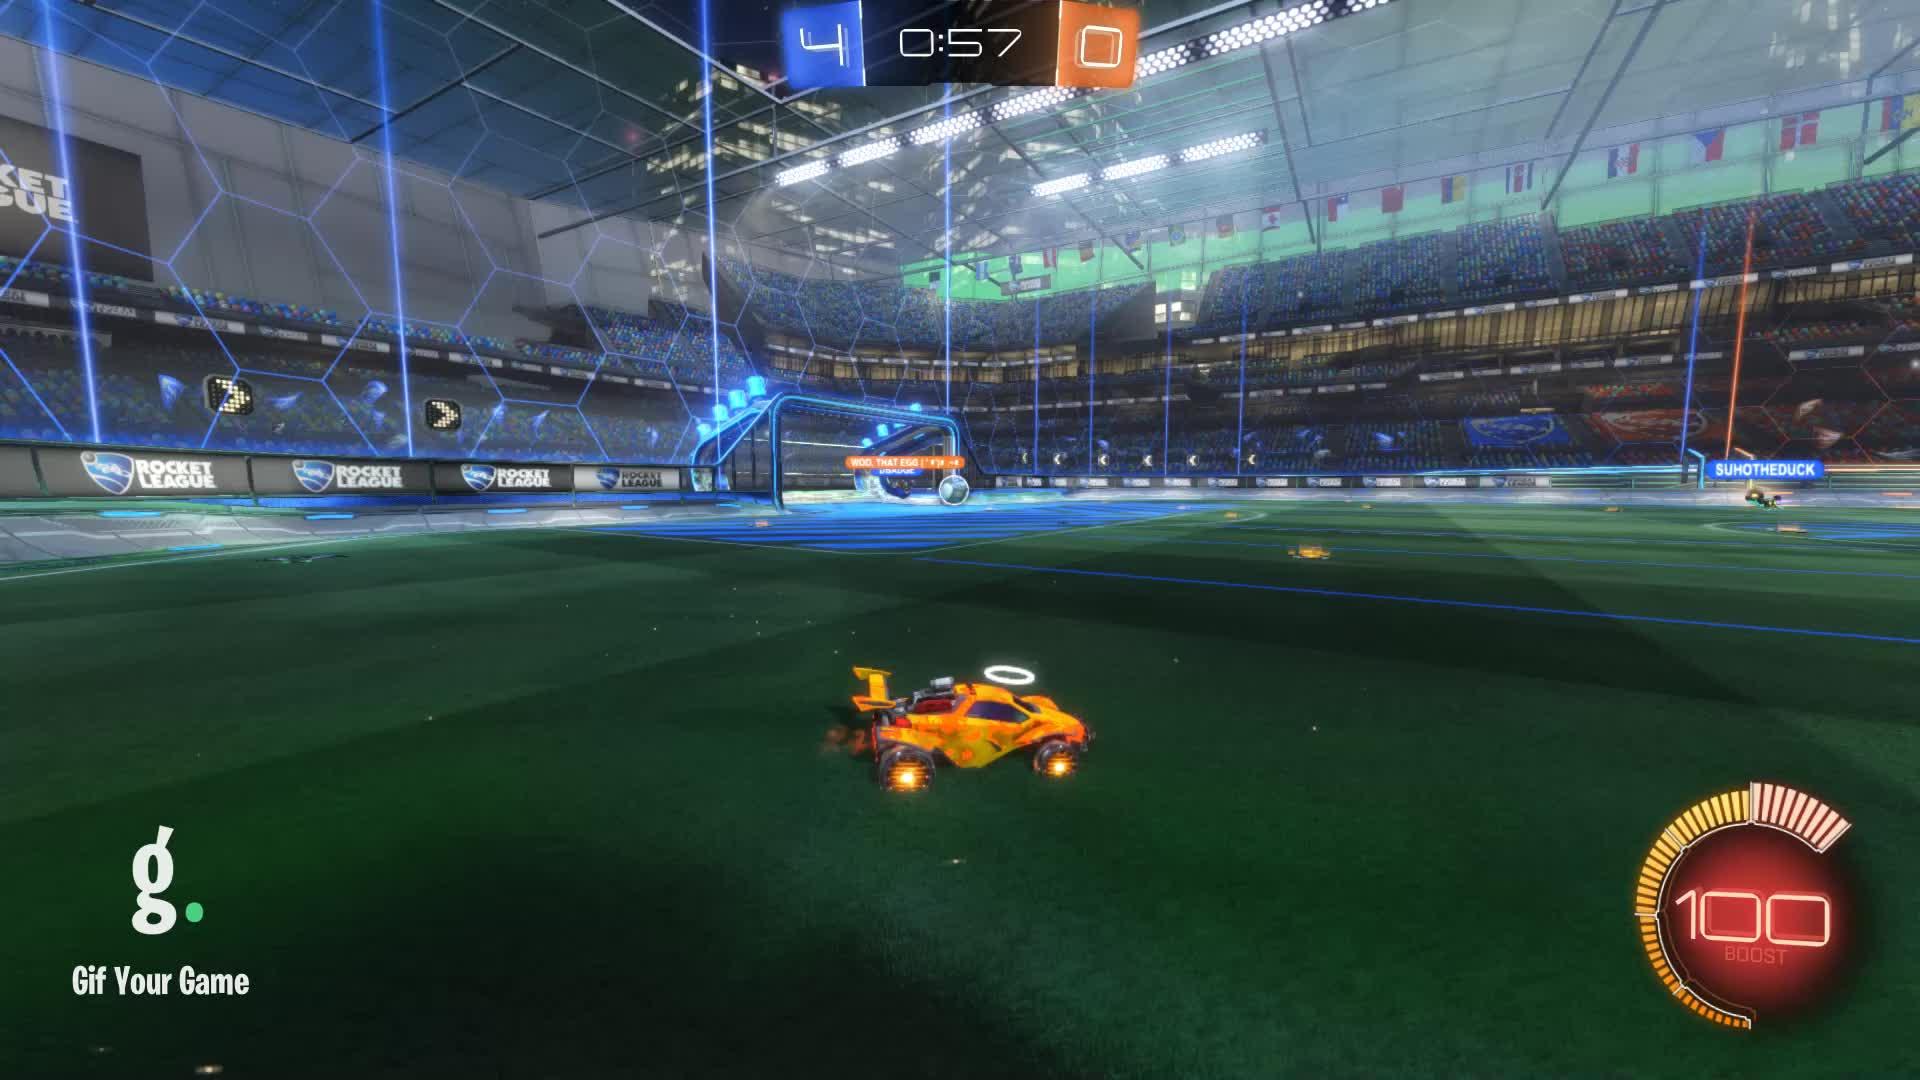 Gif Your Game, GifYourGame, Goal, Rocket League, RocketLeague, Zoar, Goal 5: Zoar GIFs